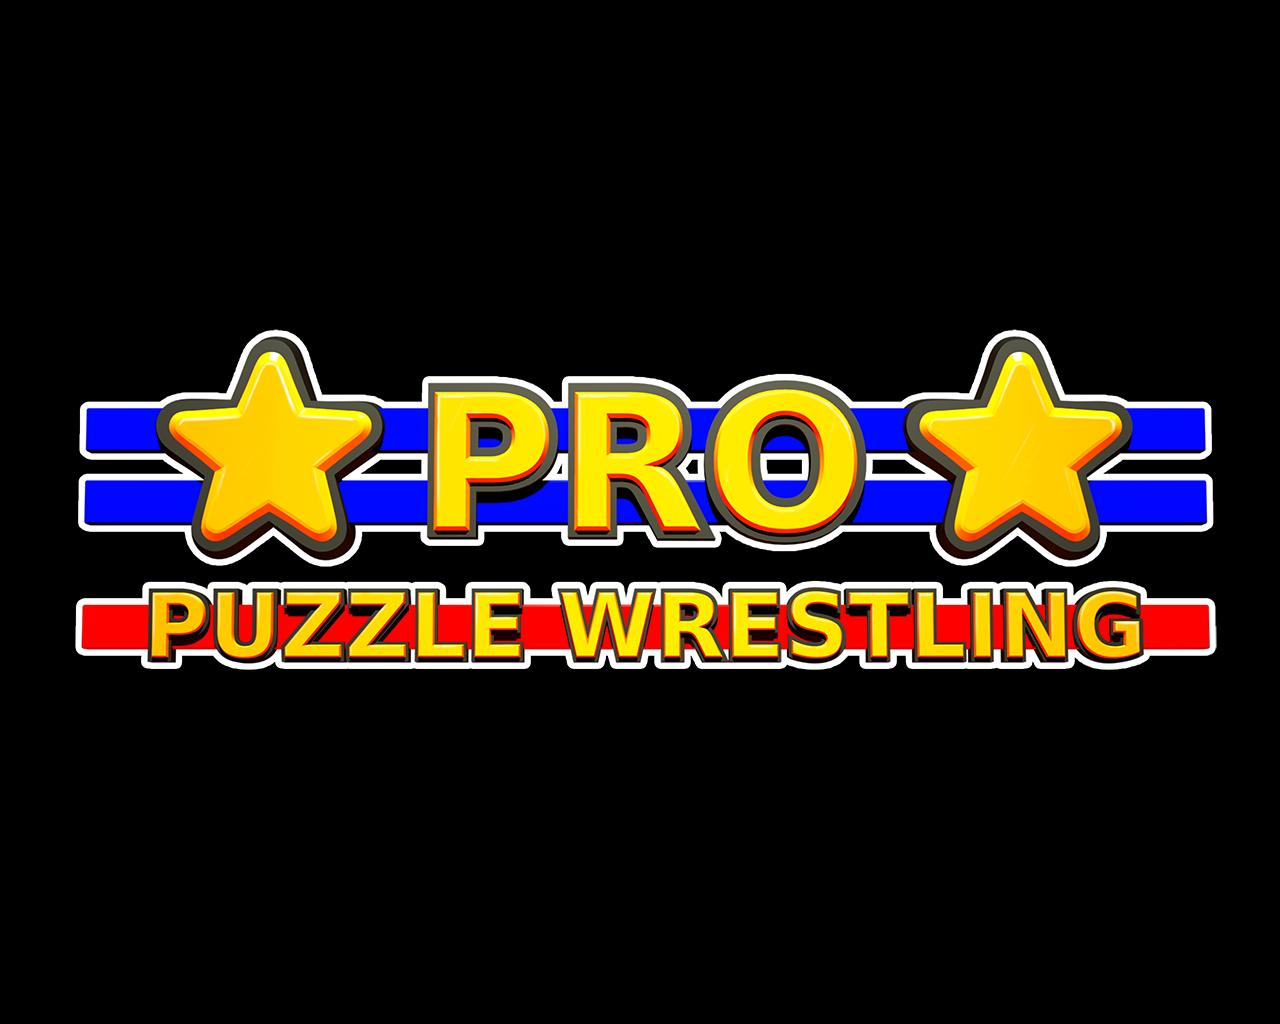 Pro Puzzle Wrestling